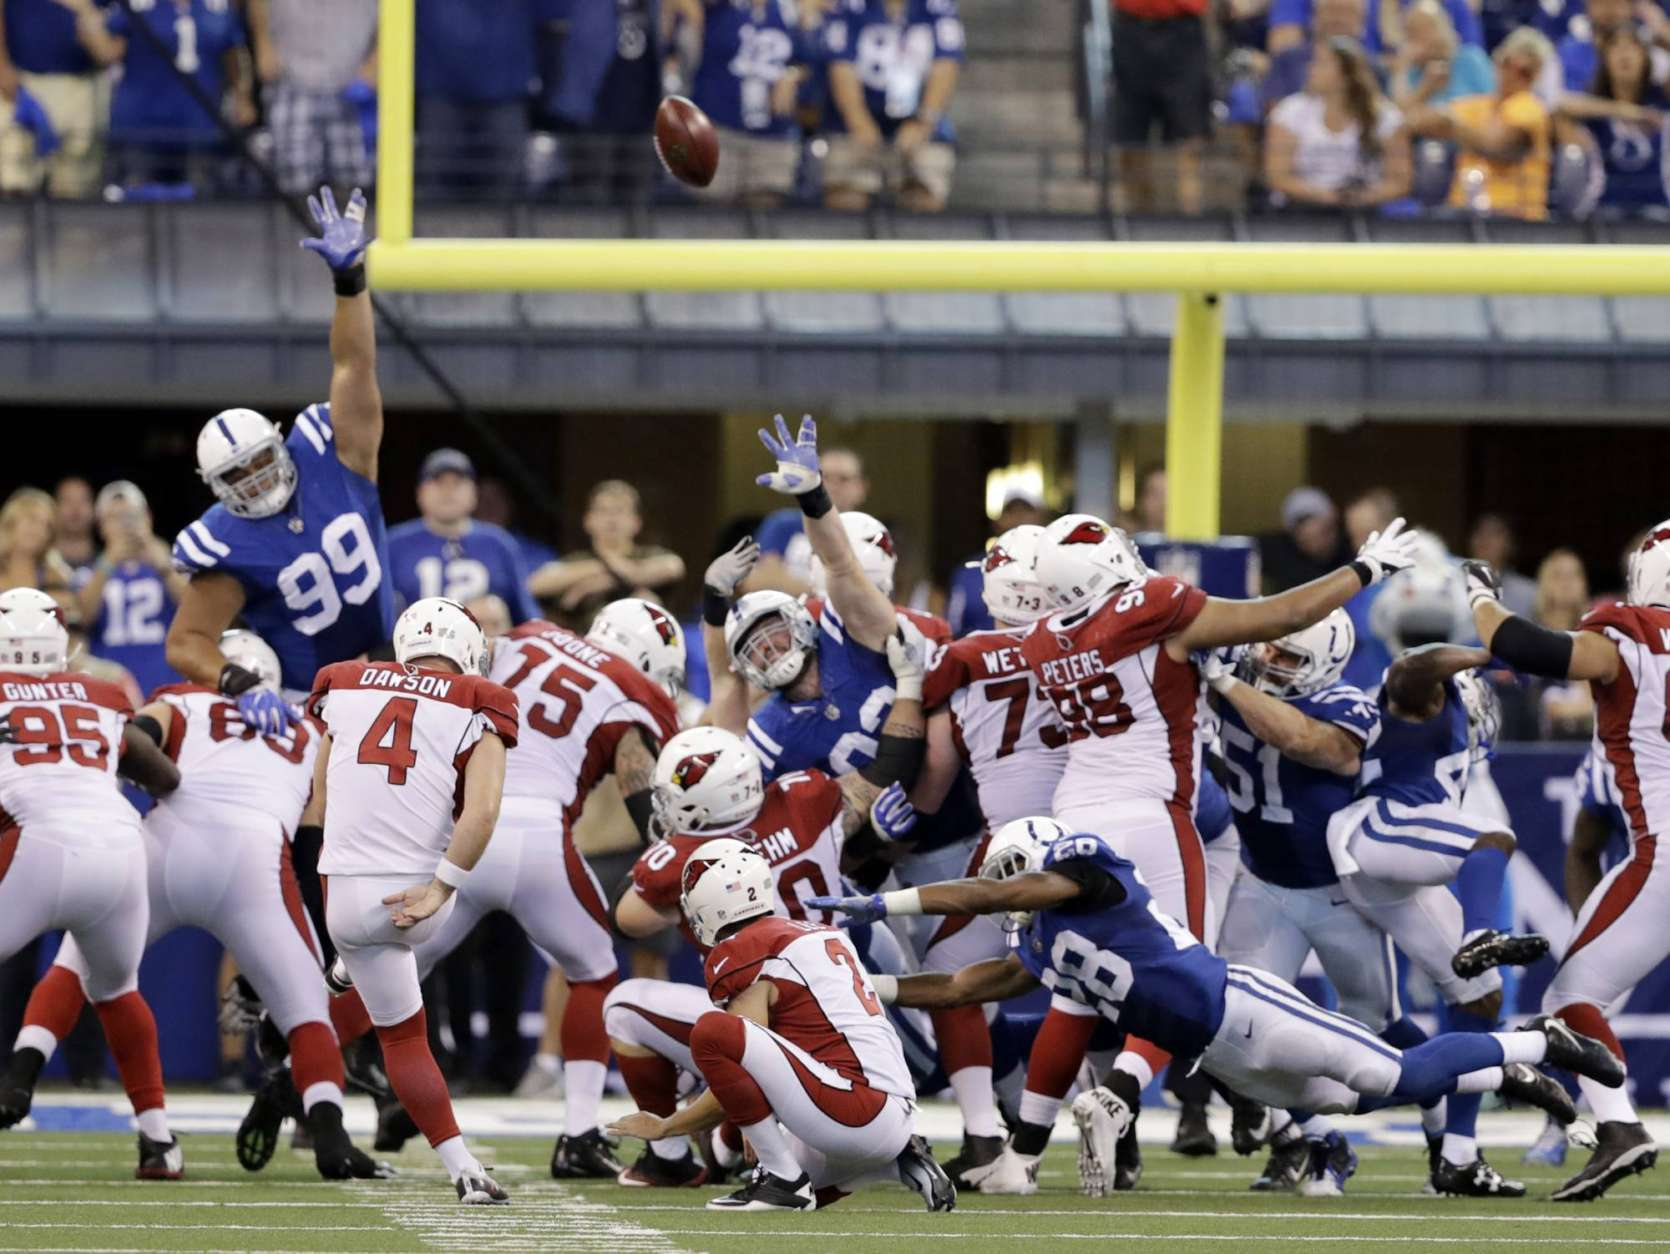 Cardinals_Colts_Football_45375-1670x1254_283981